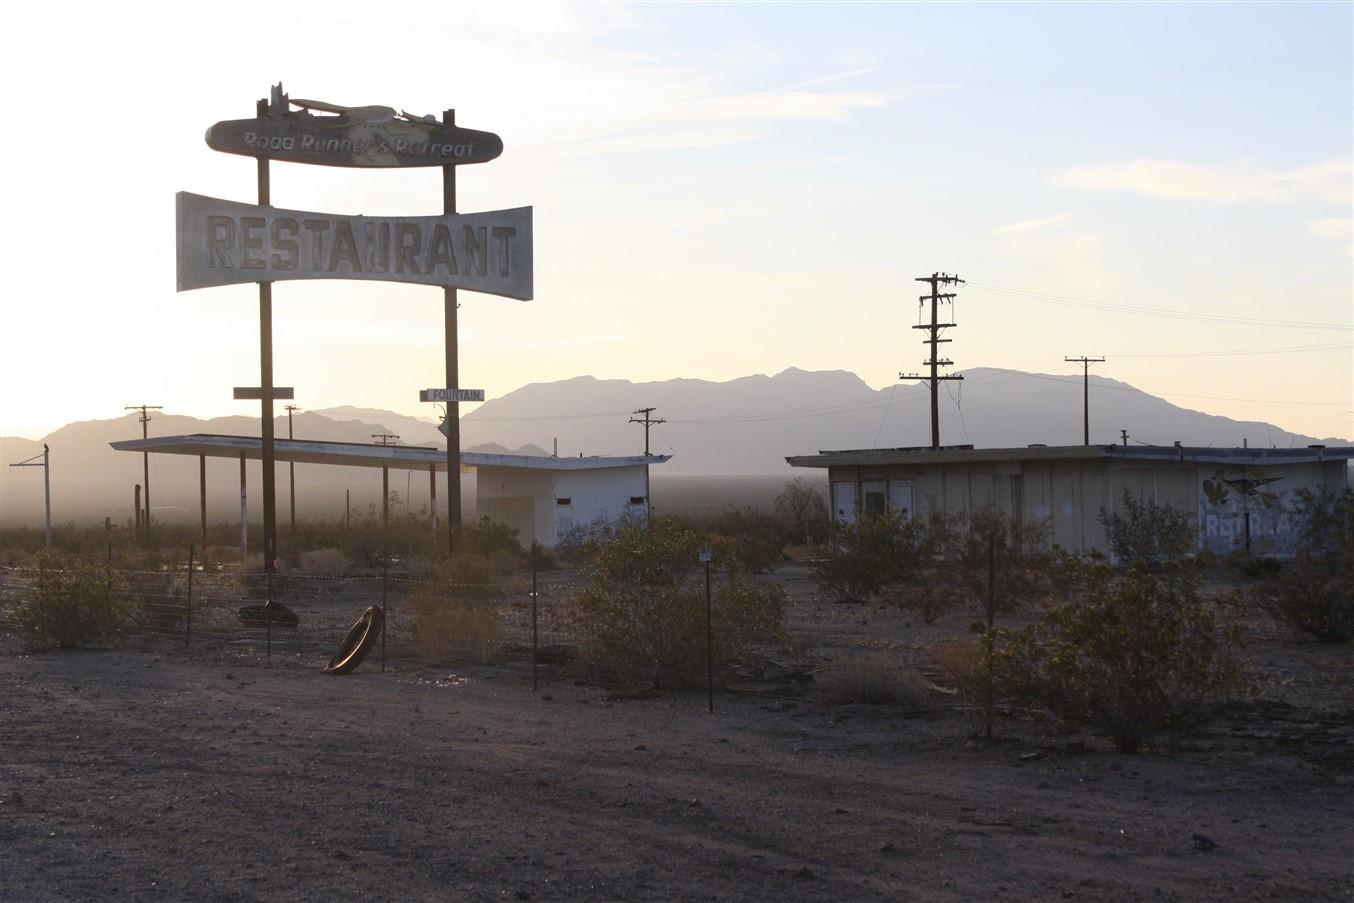 2012 03 14 Route 66 Road Trip 25 California Desert.jpg